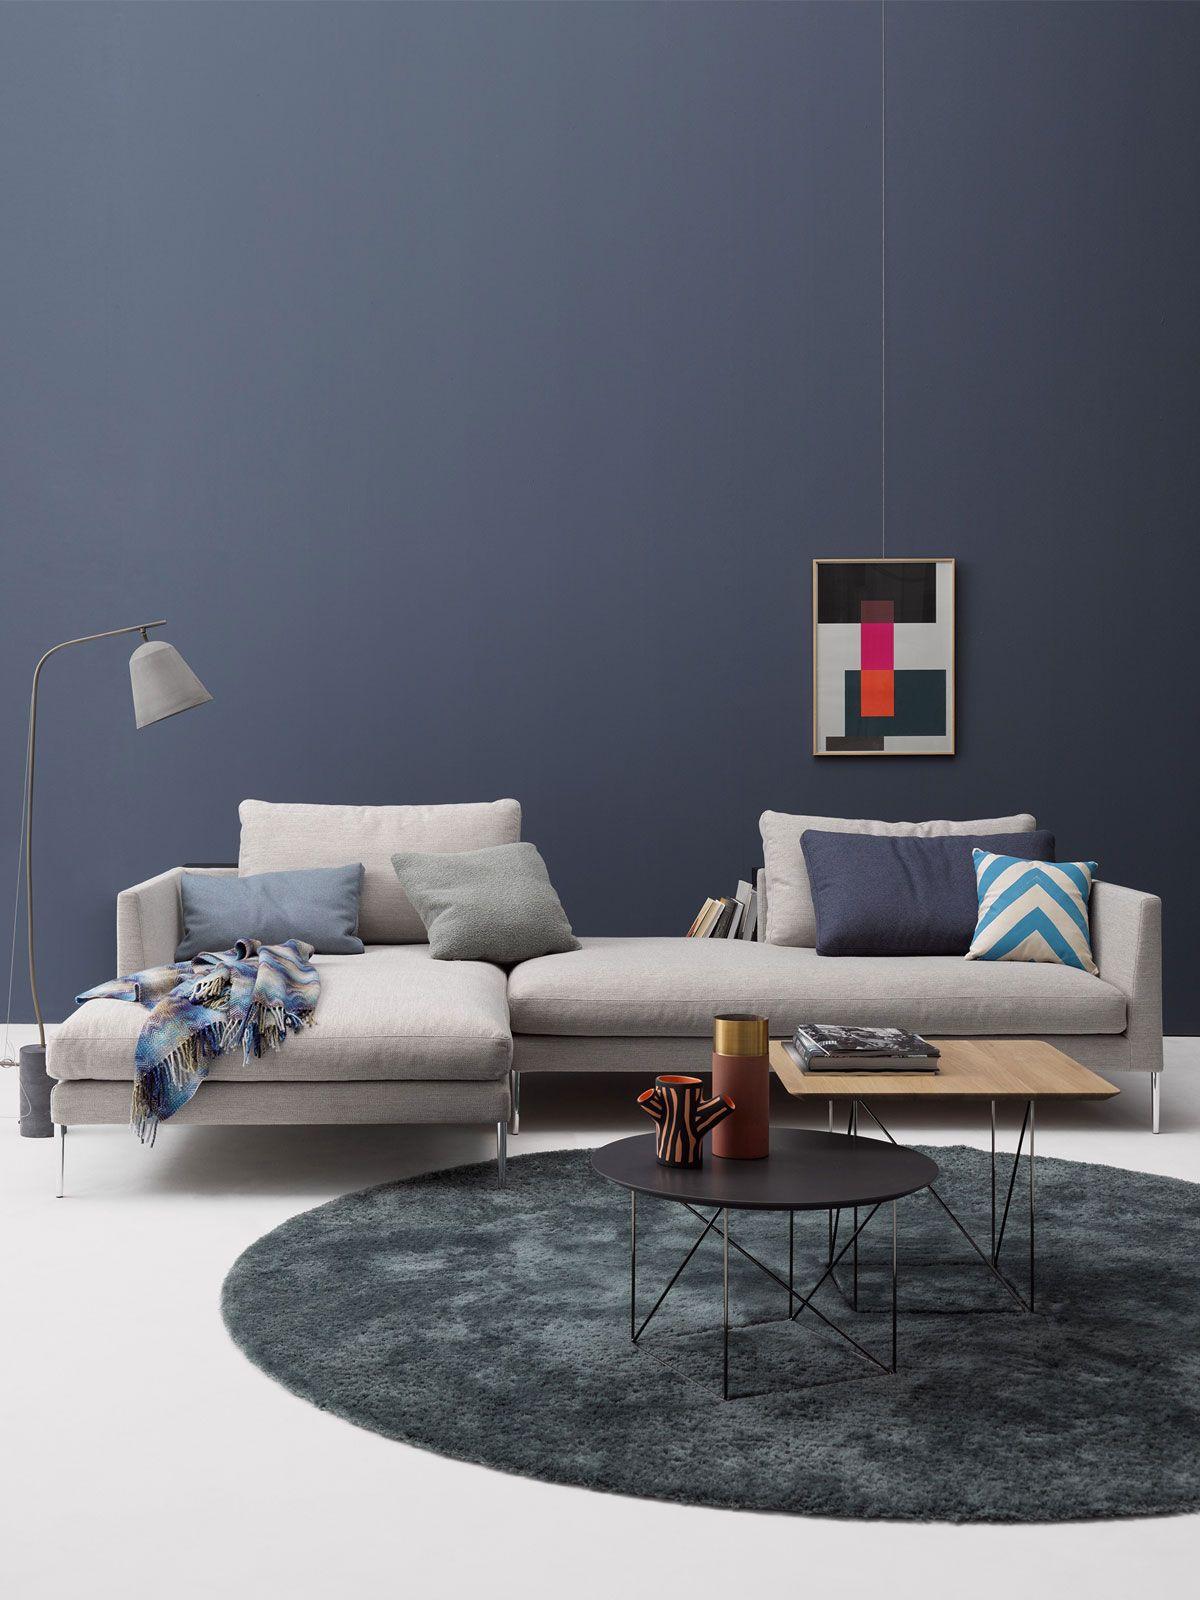 Pilotis Sofa: COR | COR | Pinterest | Room interior, Interiors and Room